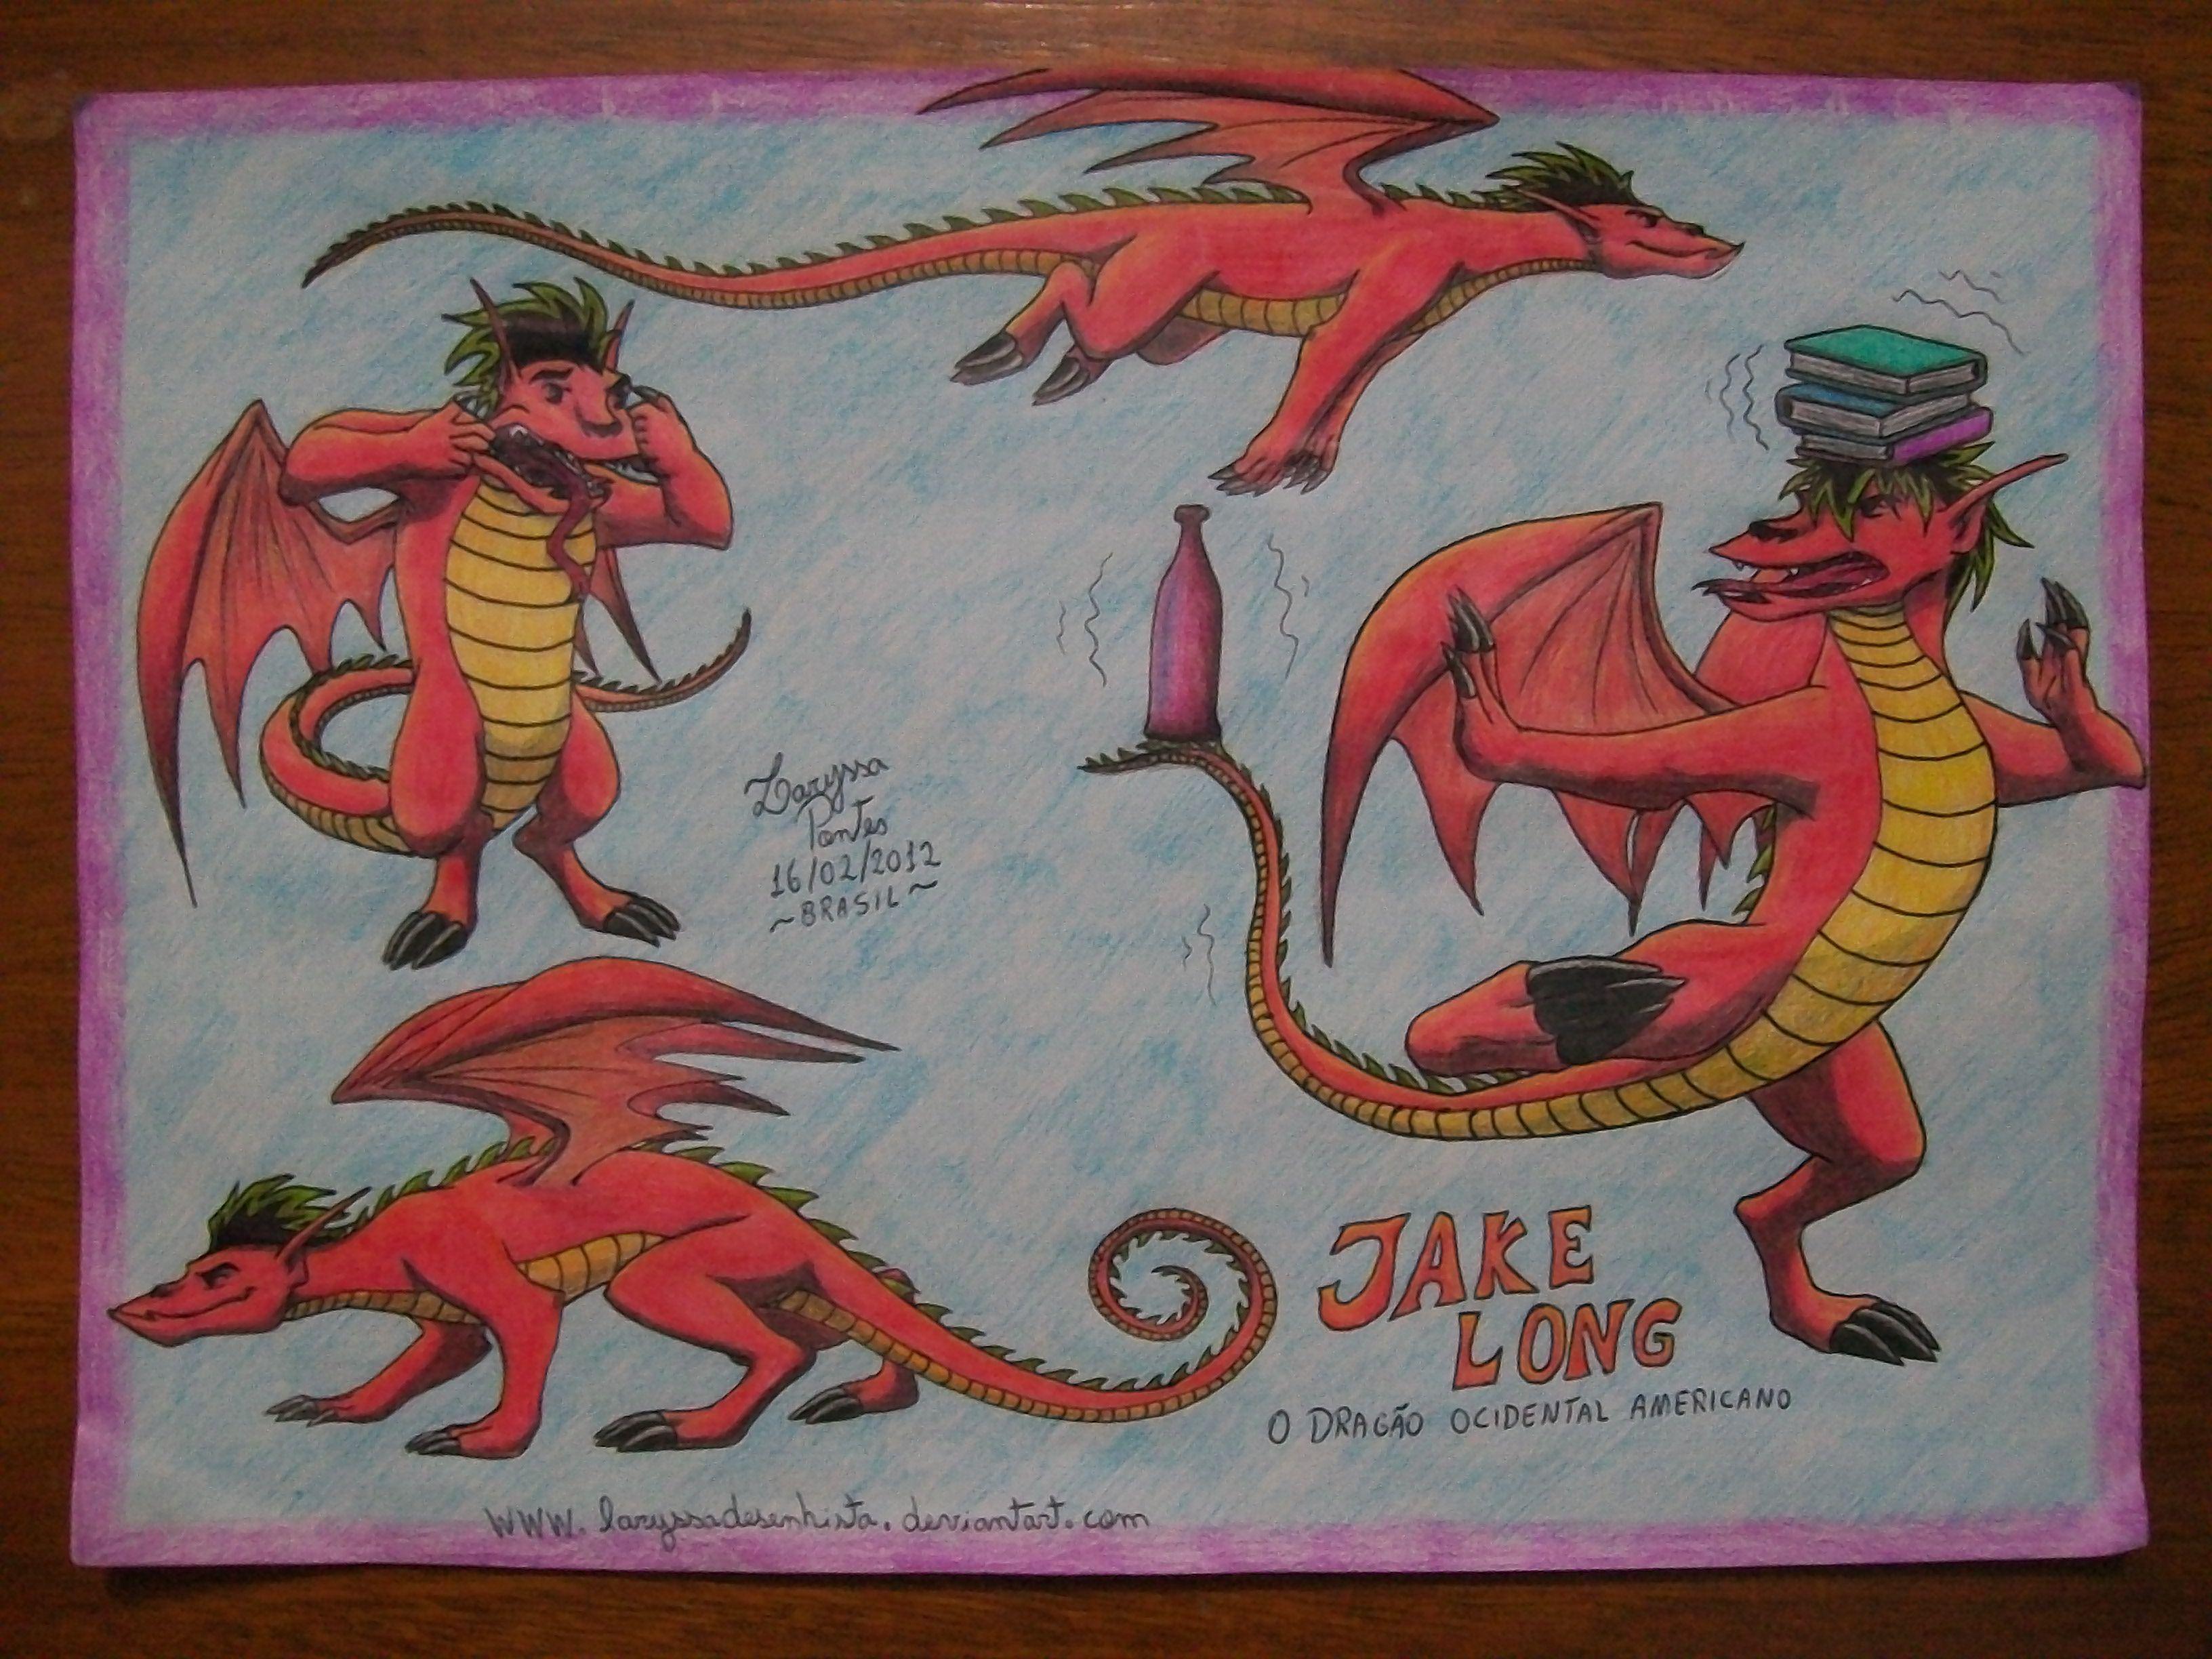 Best 25 dragon occidental ideas on pinterest randy cunningham jake long the american dragon by laryssadesenhistaiantart on deviantart ccuart Gallery